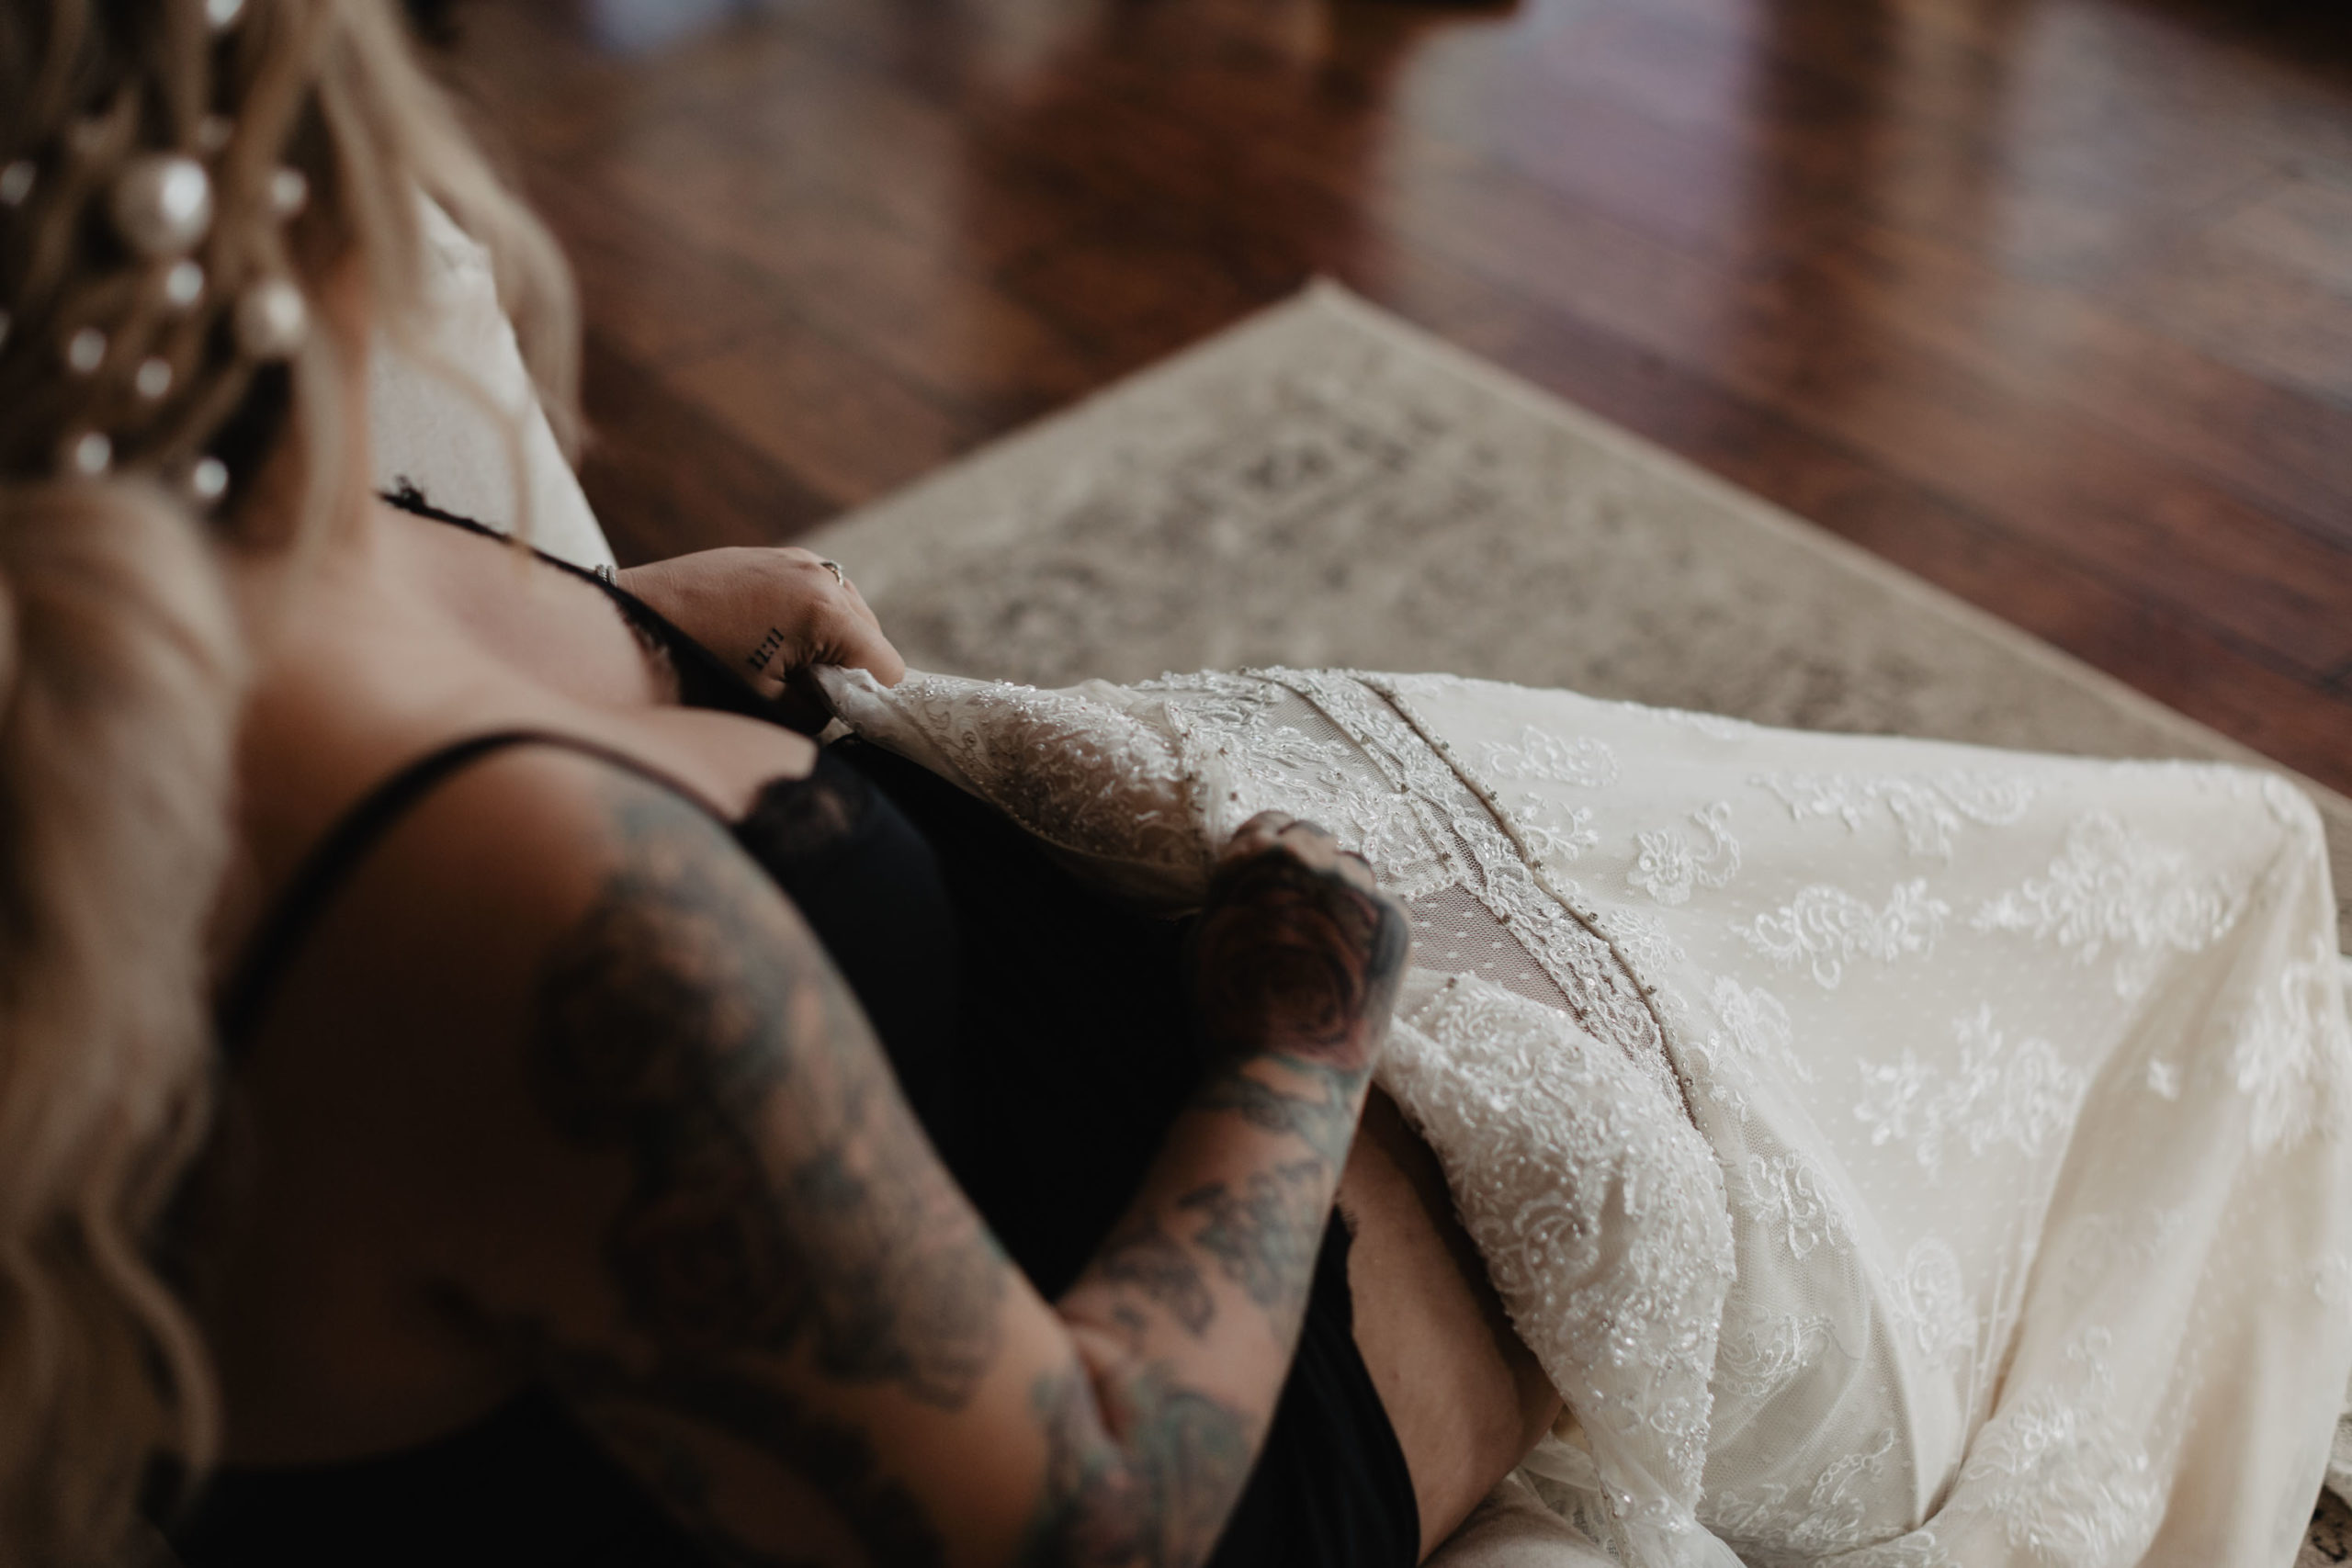 tattooed bride putting on wedding dress